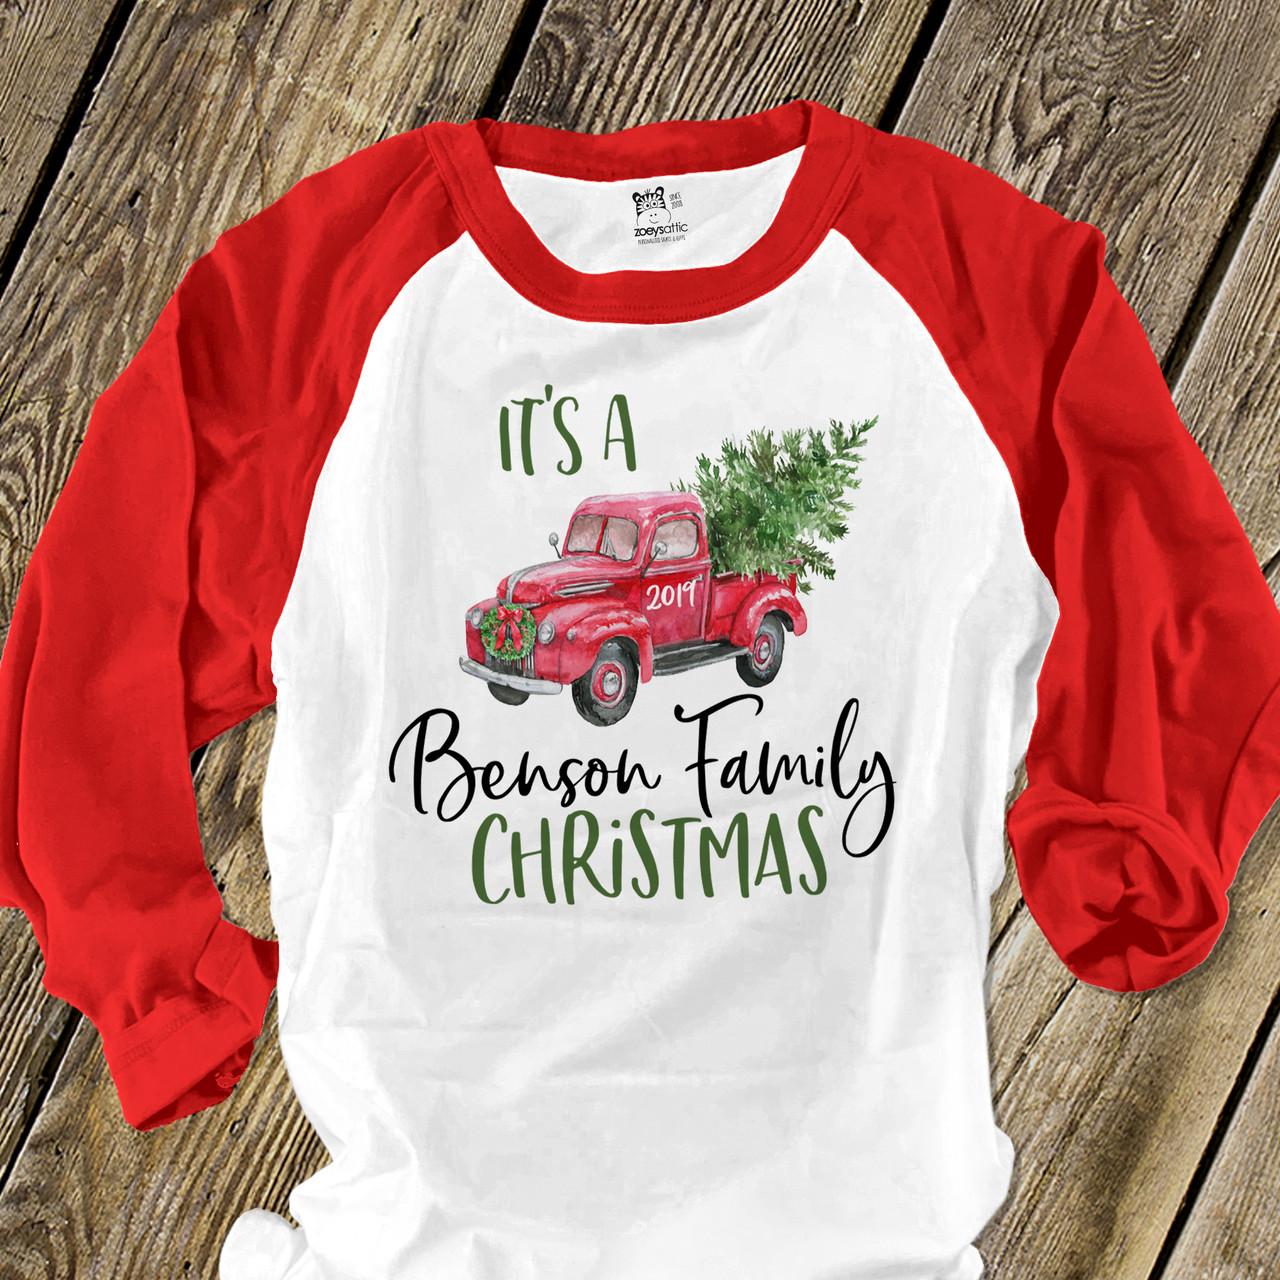 Santa Claus Personalized Christmas Raglan l Christmas Shirt l Personalized Christmas Raglan Shirt